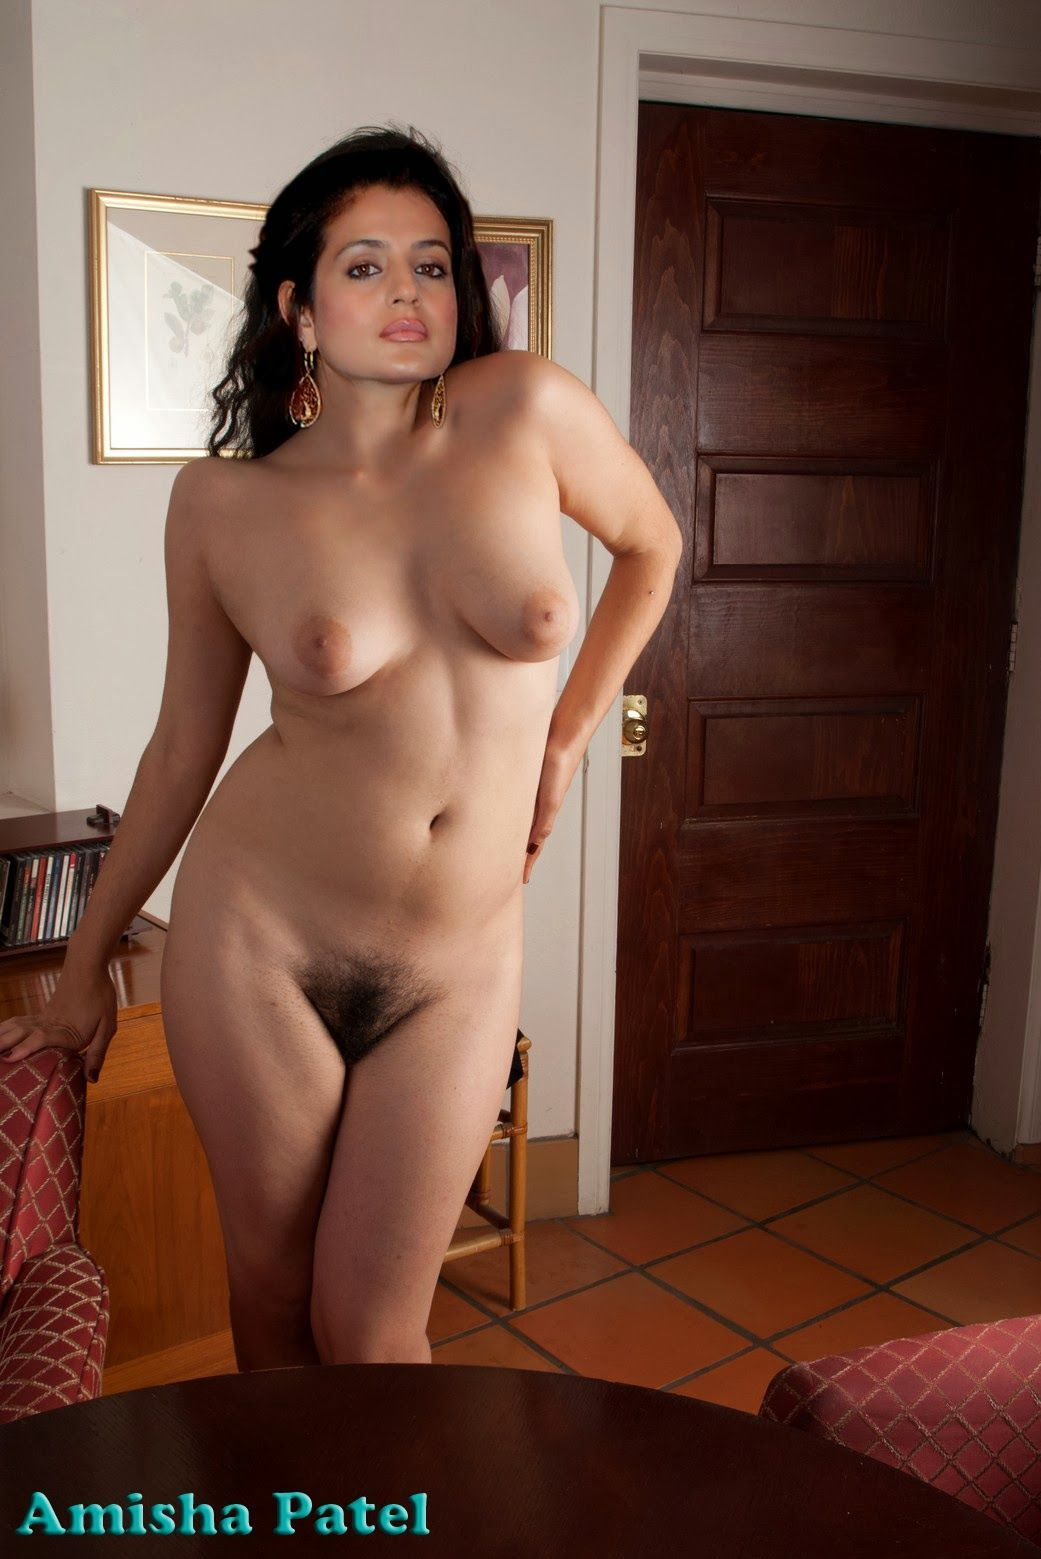 Amisha Patel Nangi Photo amisha patel xxx - new porn 100% free photos.